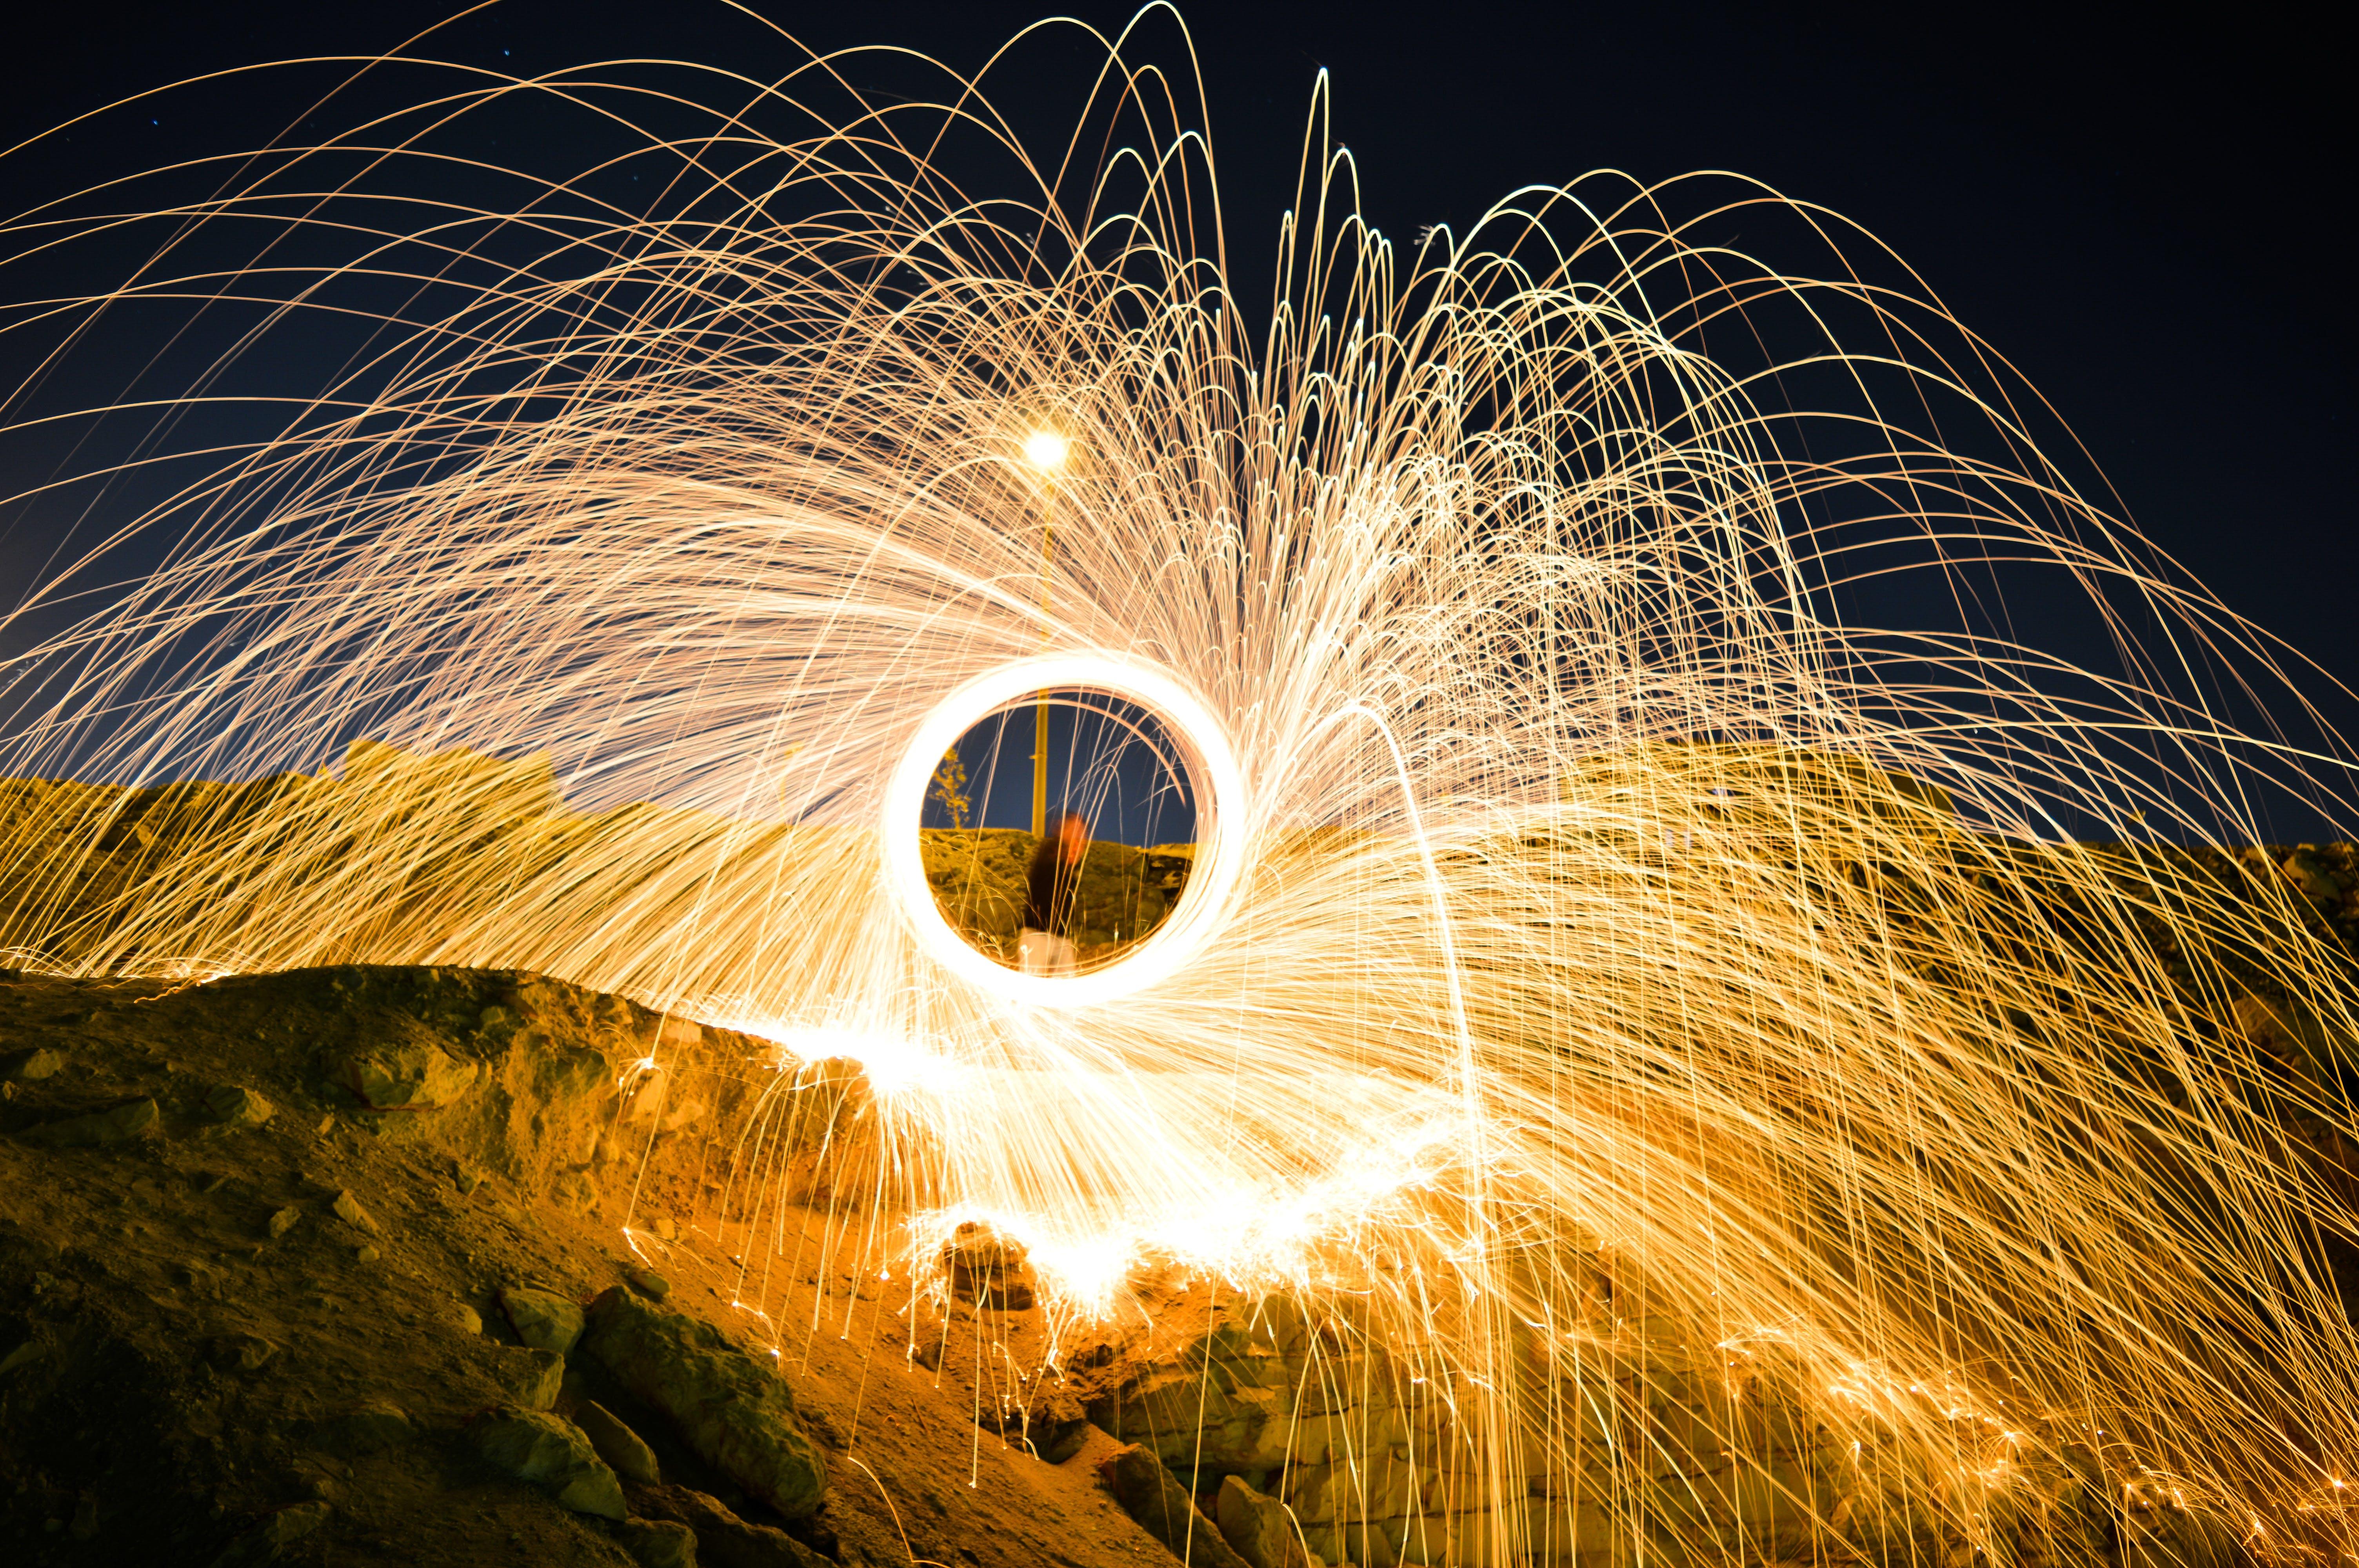 Steel-wool Photography